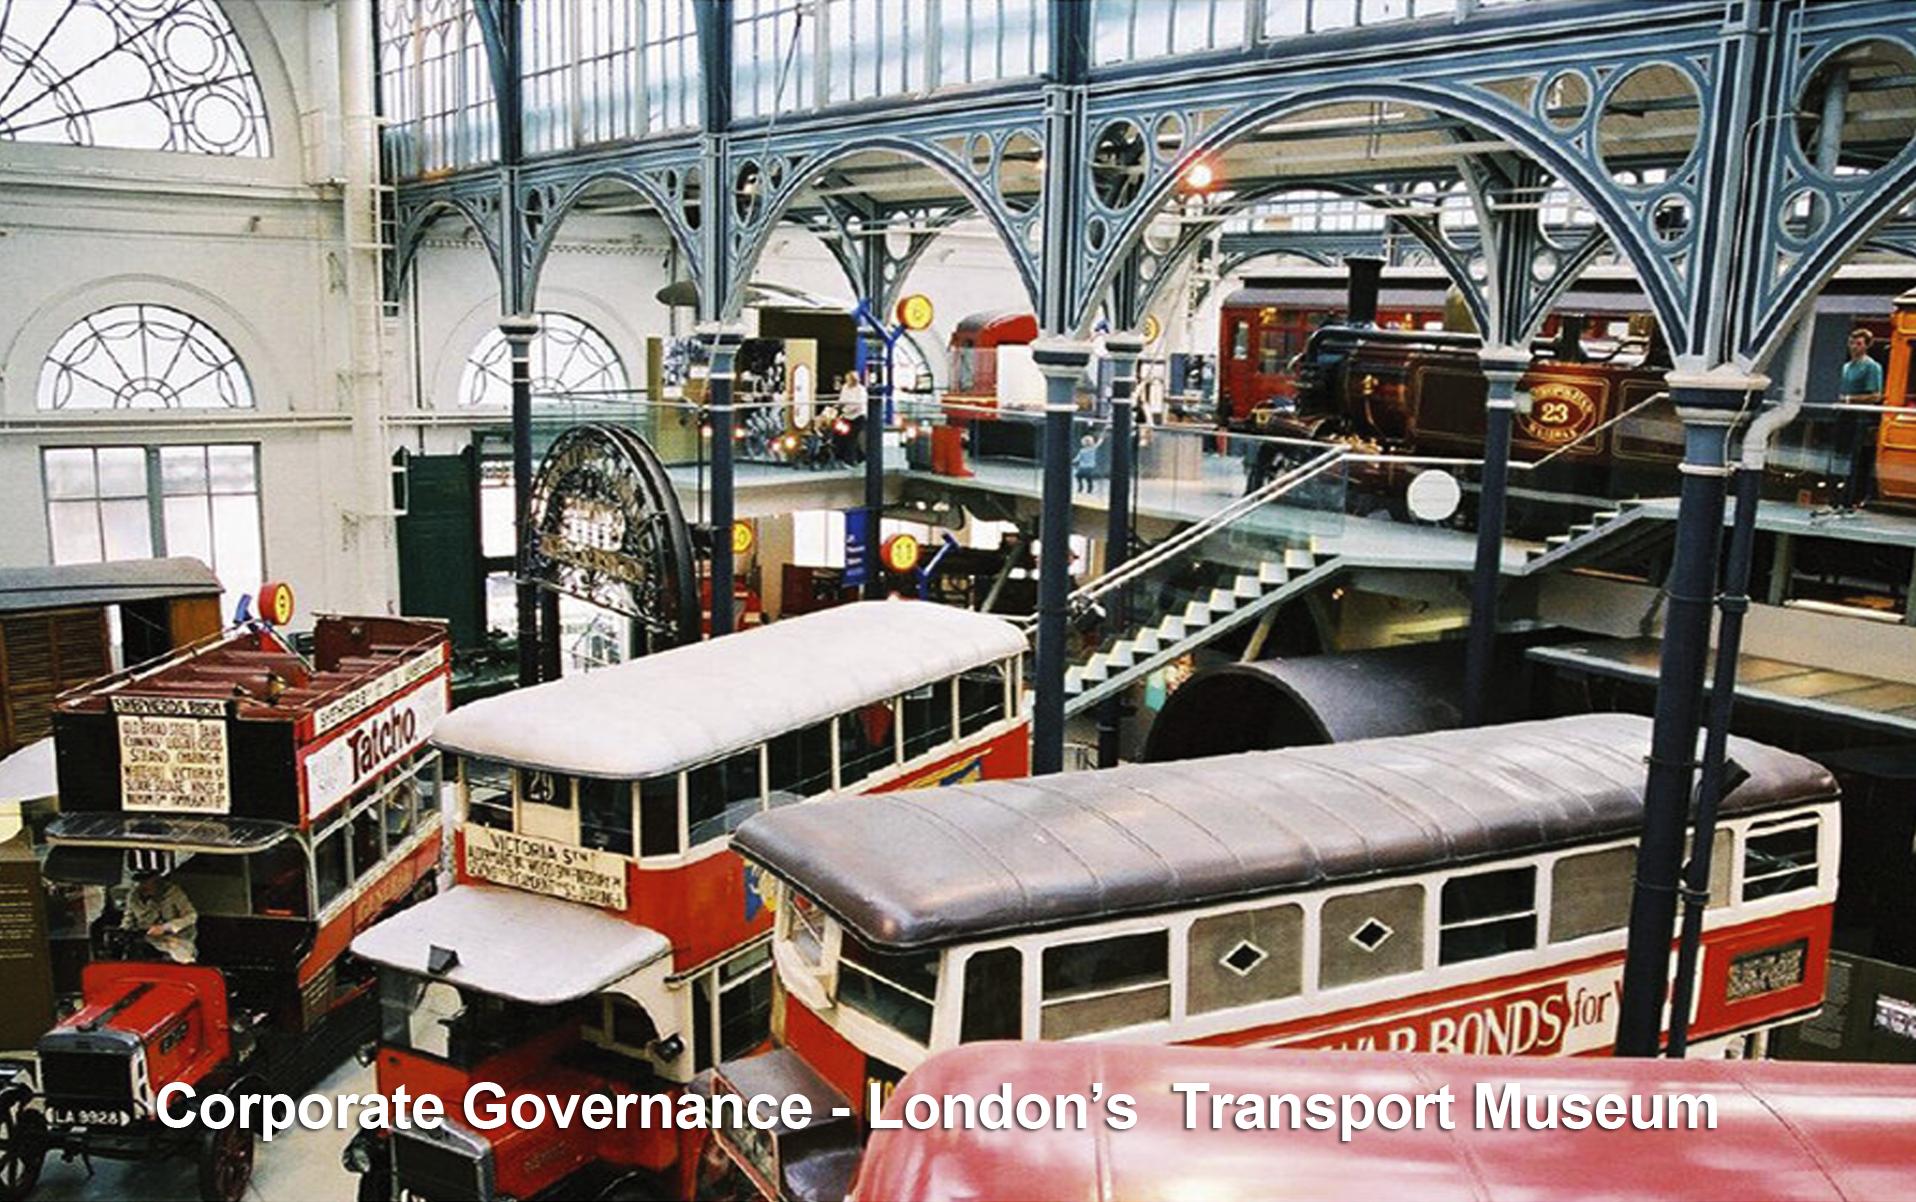 Corporate Governance - London's Transport Museum